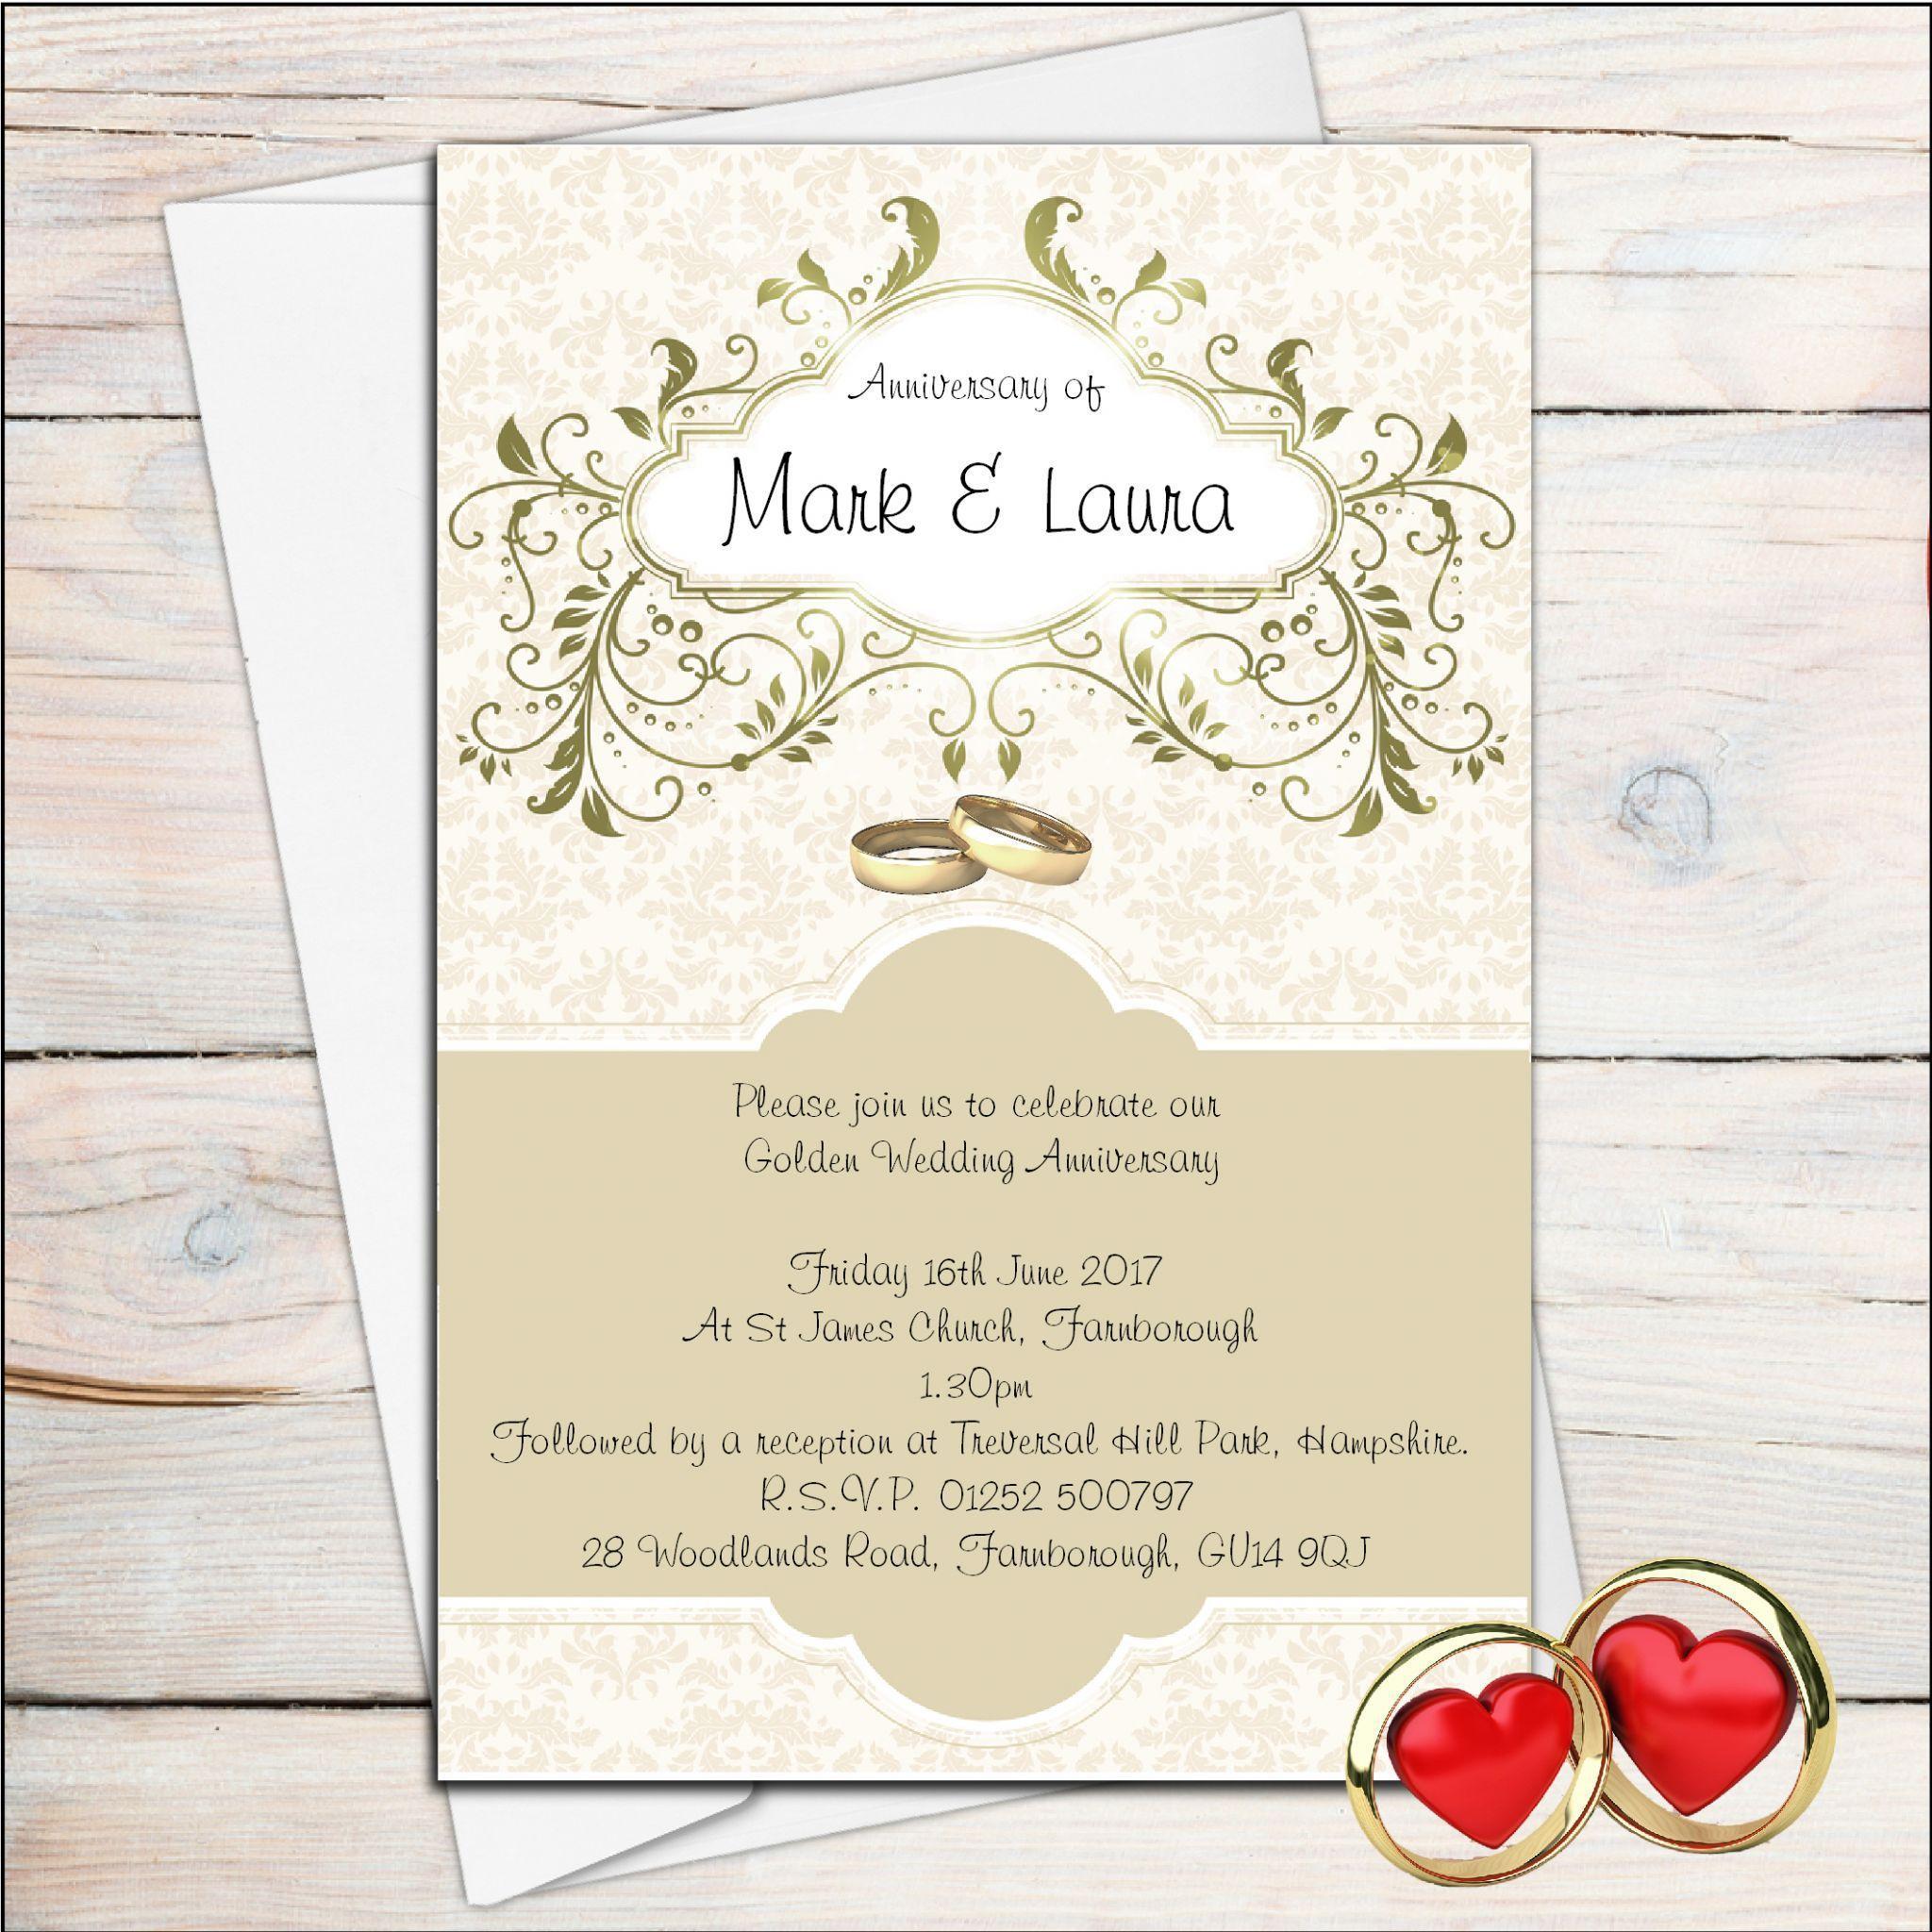 Wedding Invitation Wedding Invitation Cards Online Free Invitation For You Free Invitation For You